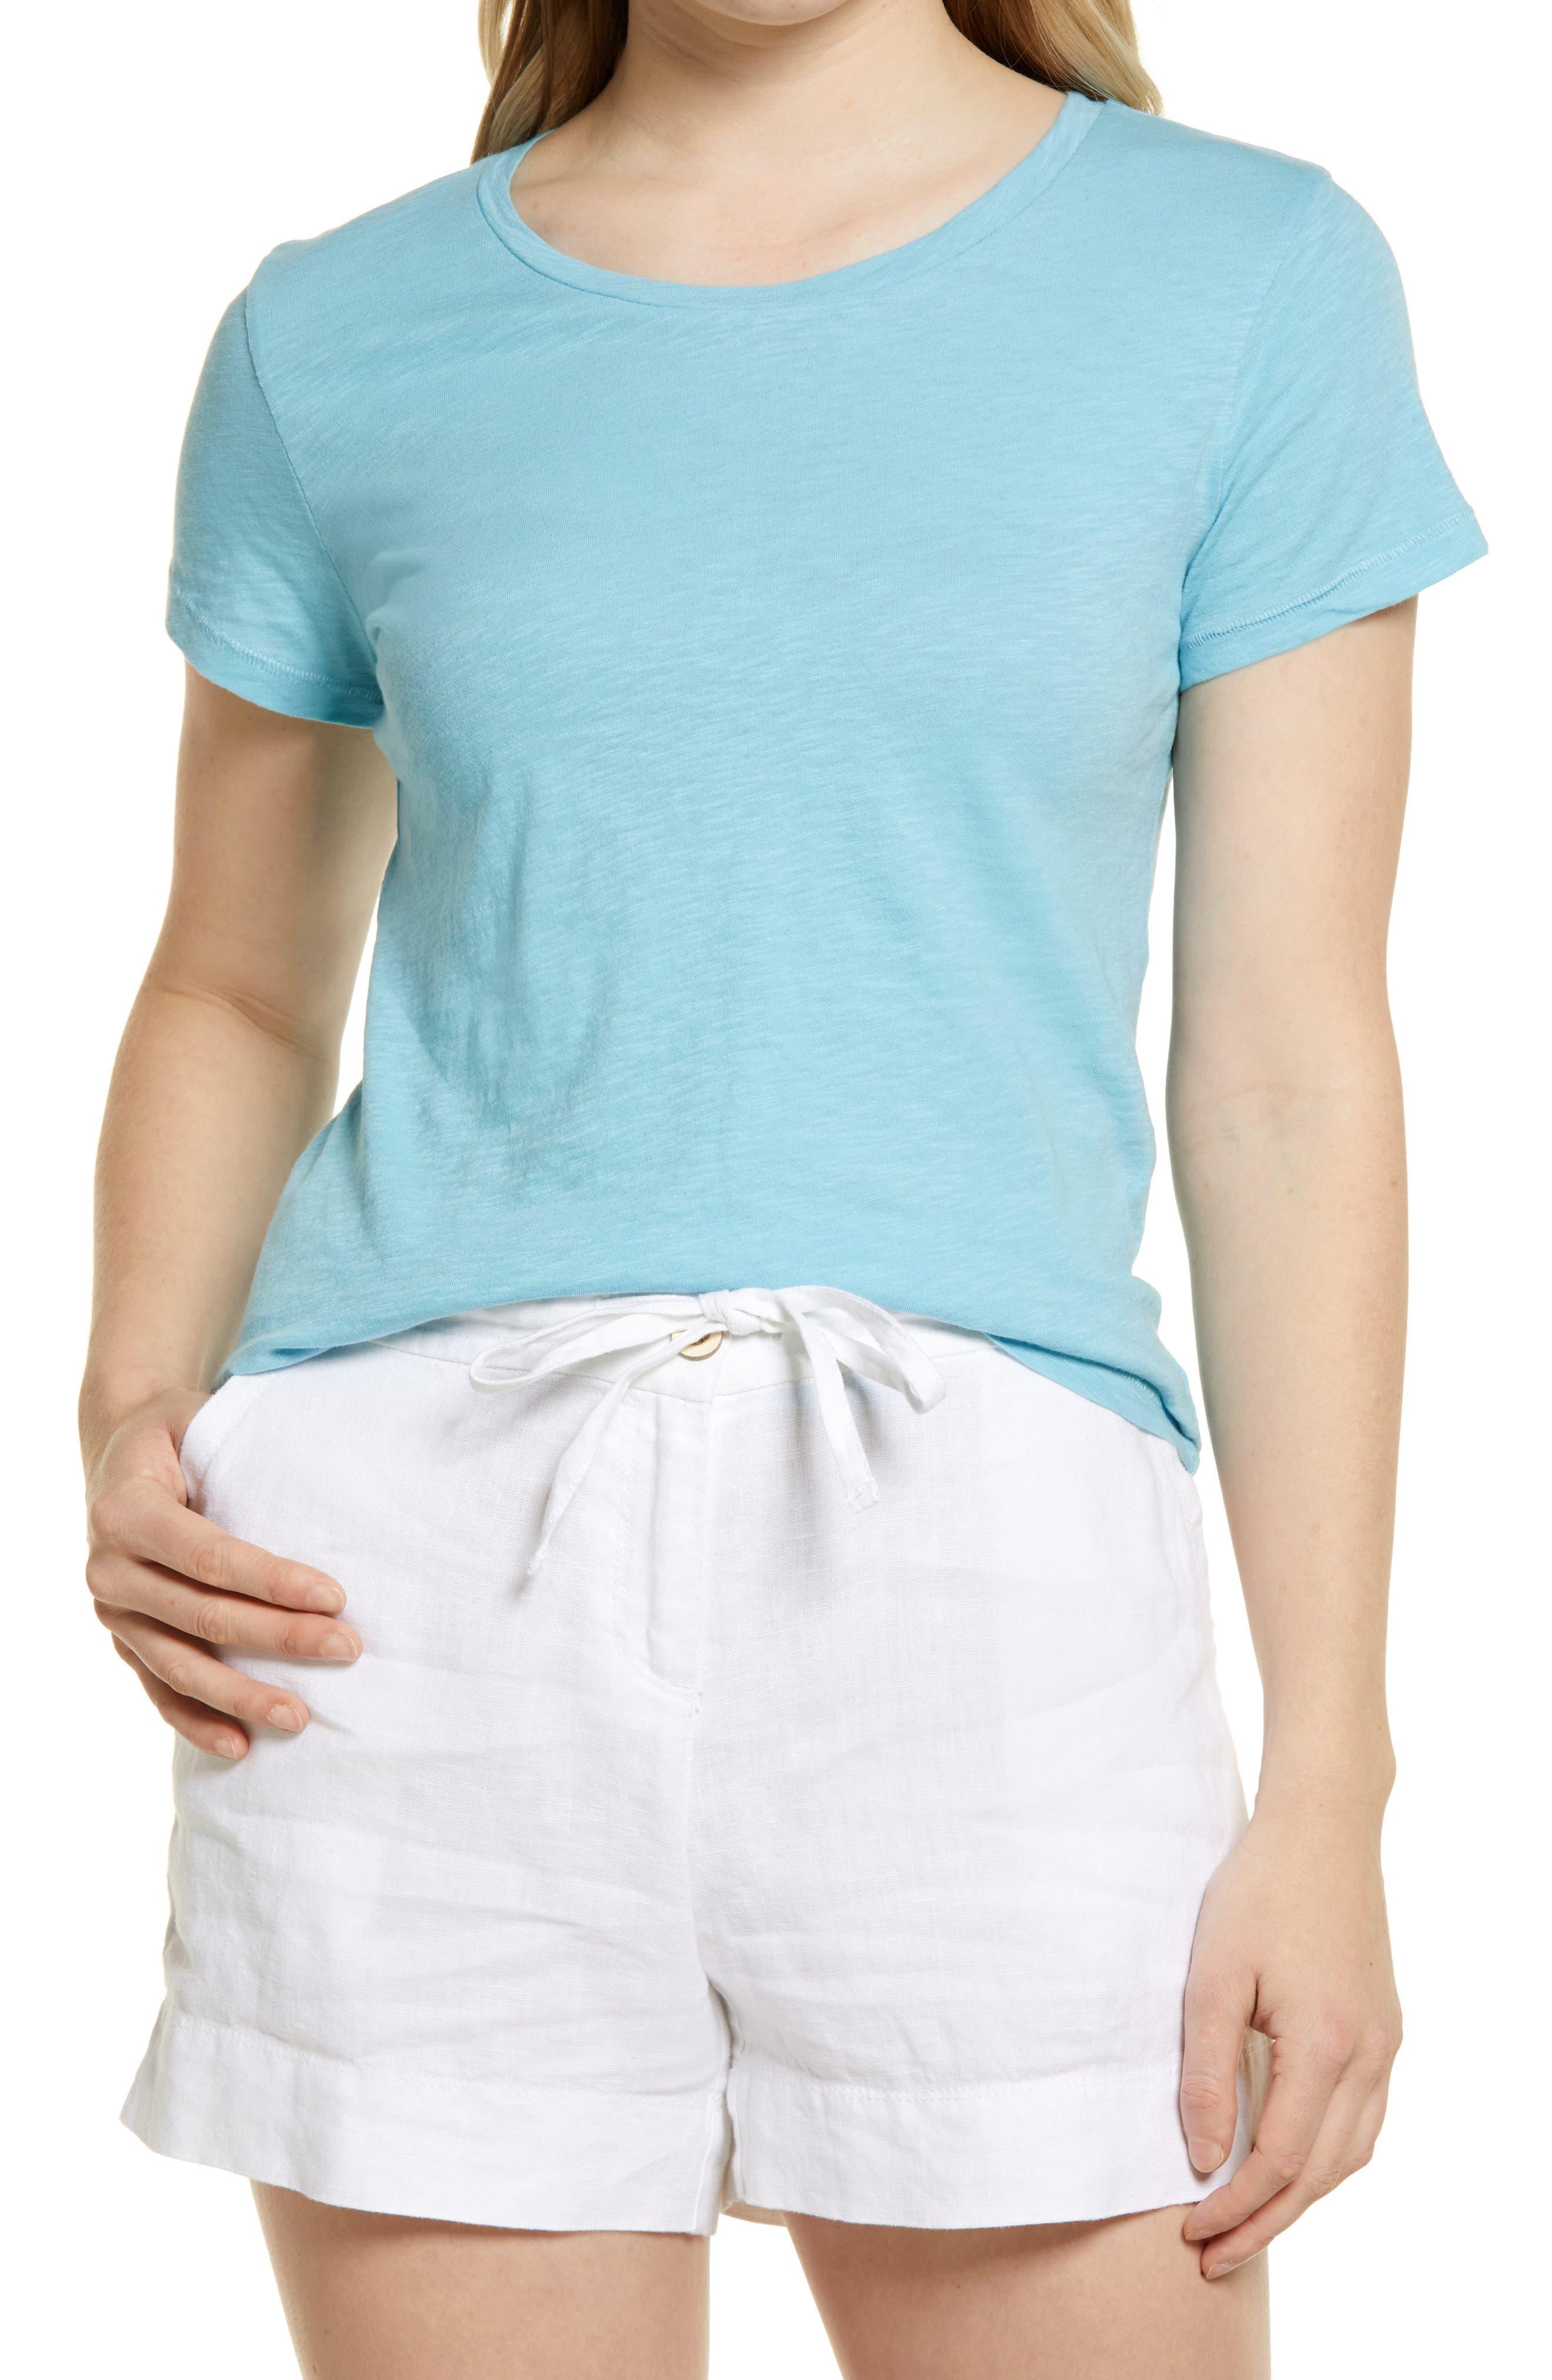 Centory T Shirts for Women Tie Dye V Neck Short Sleeve T-Shirt Loungewear Tee Tops